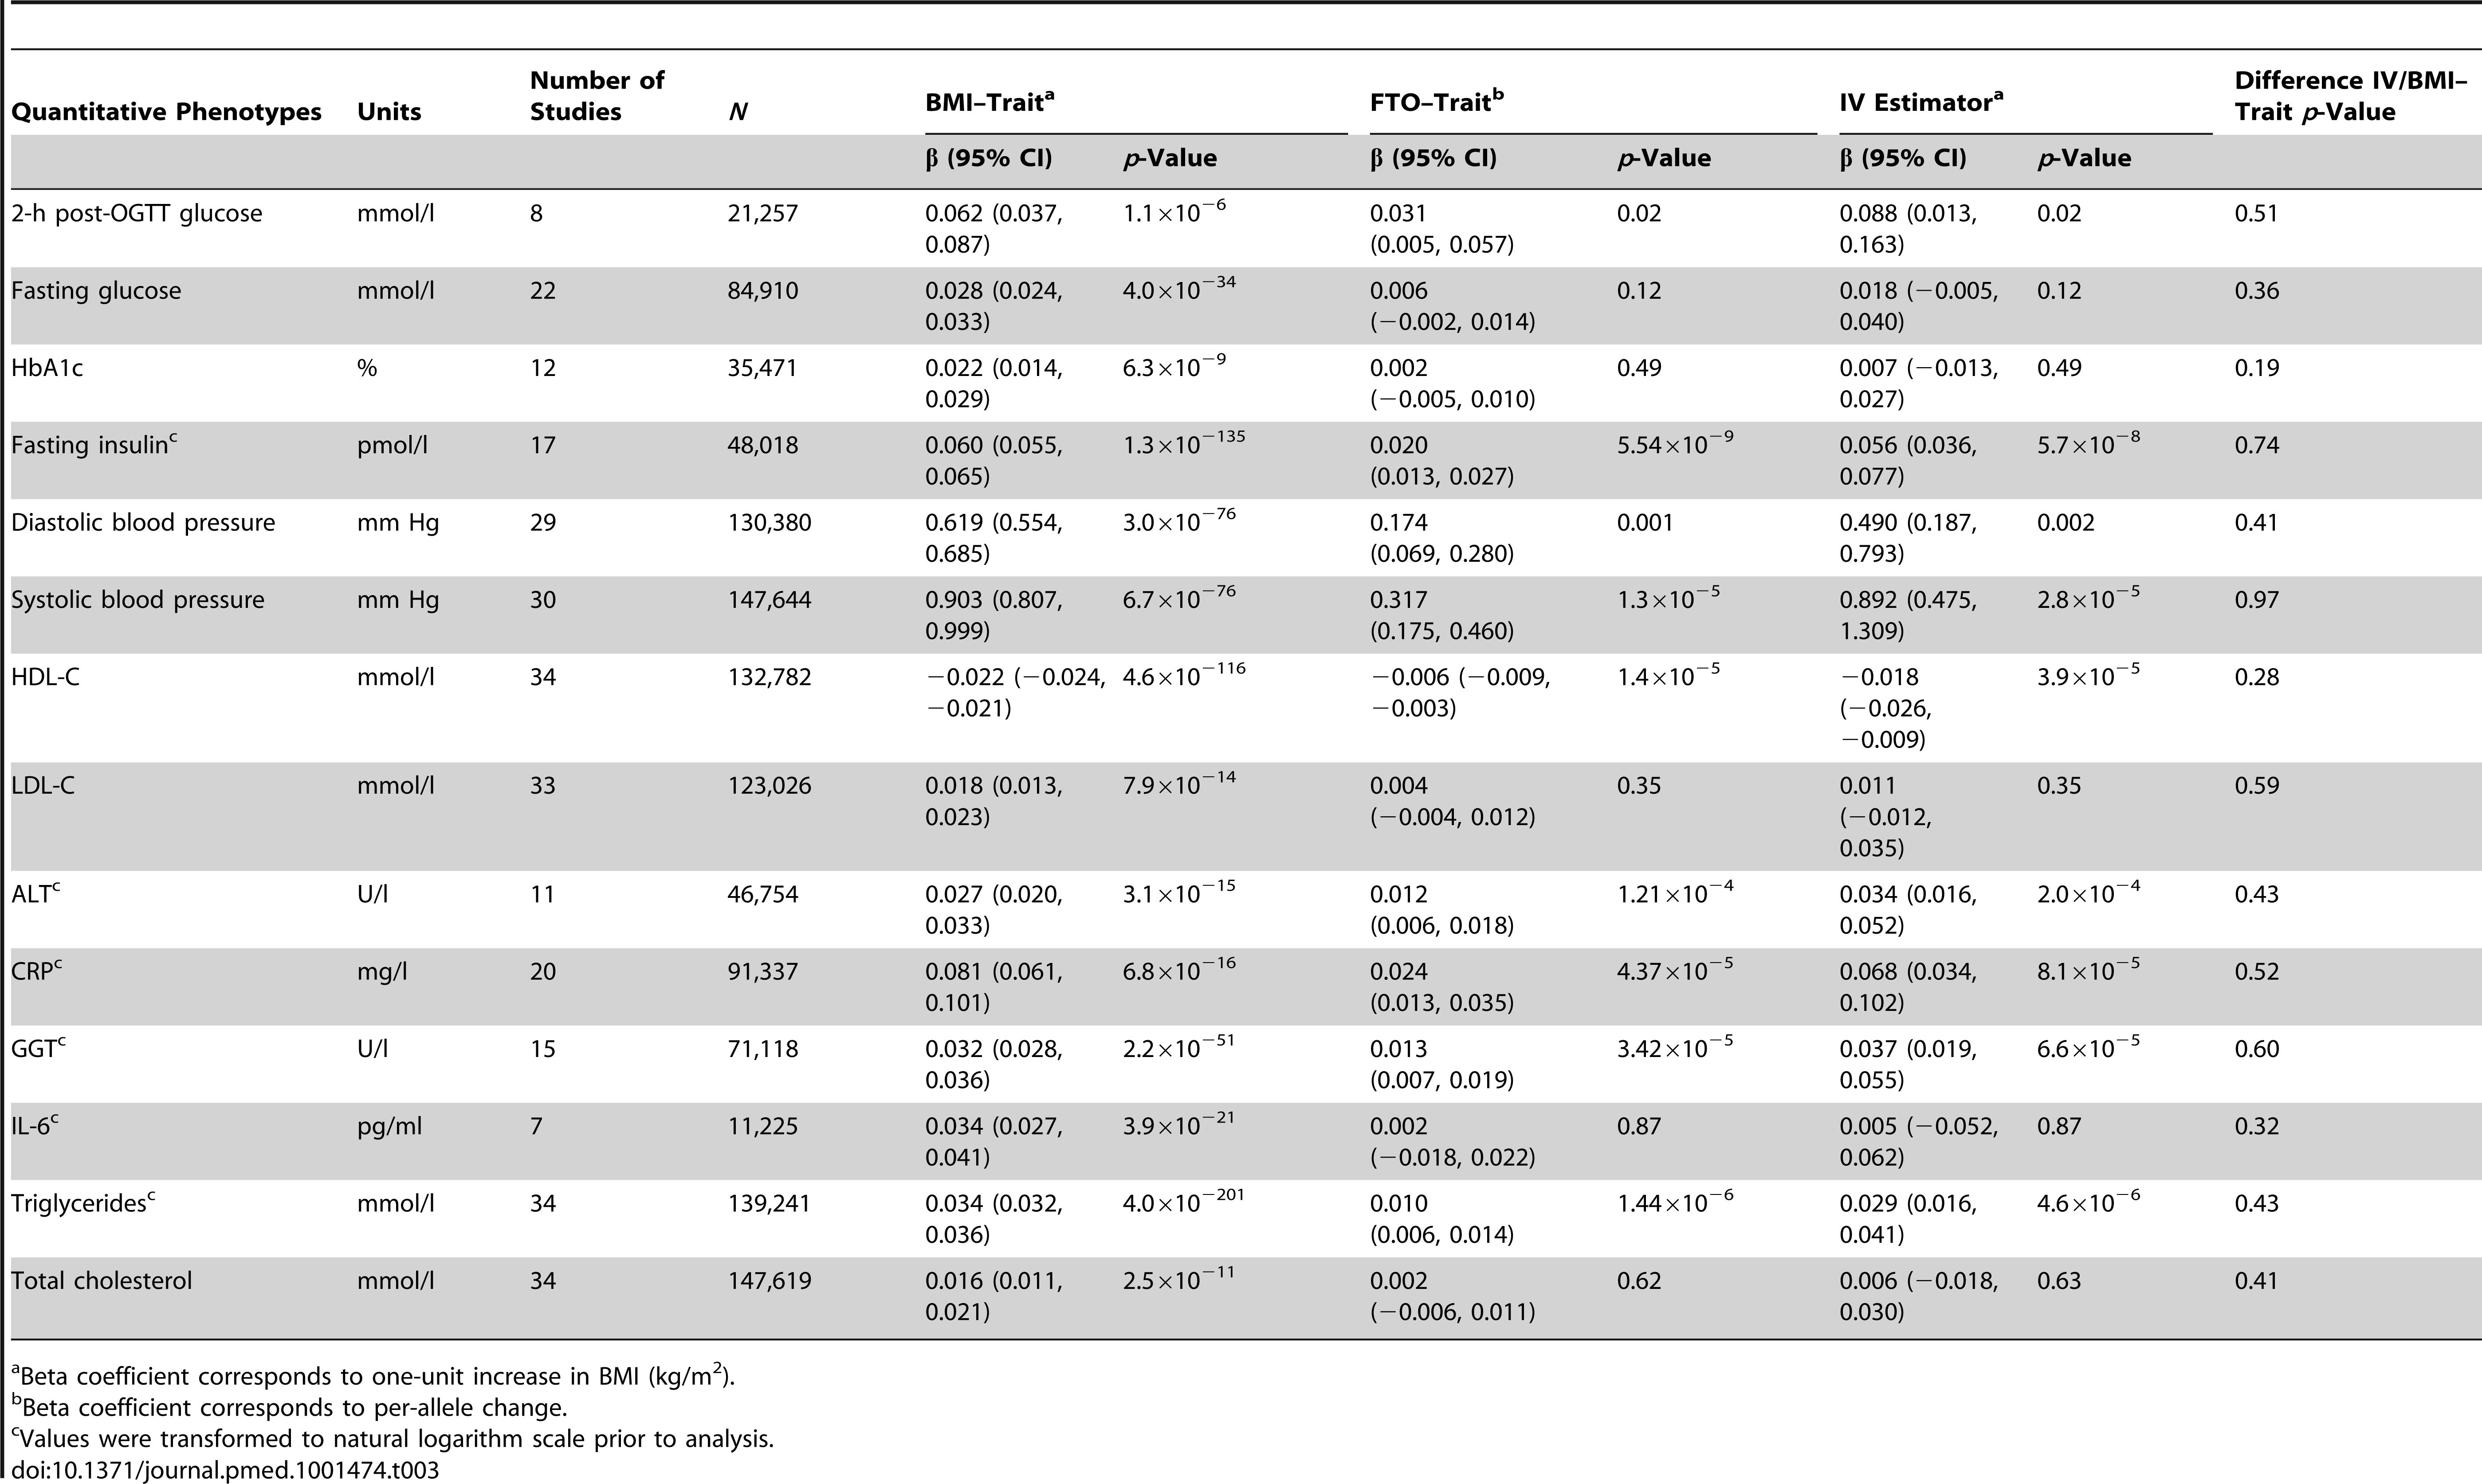 Meta-analysis results of Mendelian randomization analyses on effect of <i>FTO</i>-derived adiposity on cardiovascular and metabolic disease: quantitative phenotypes.